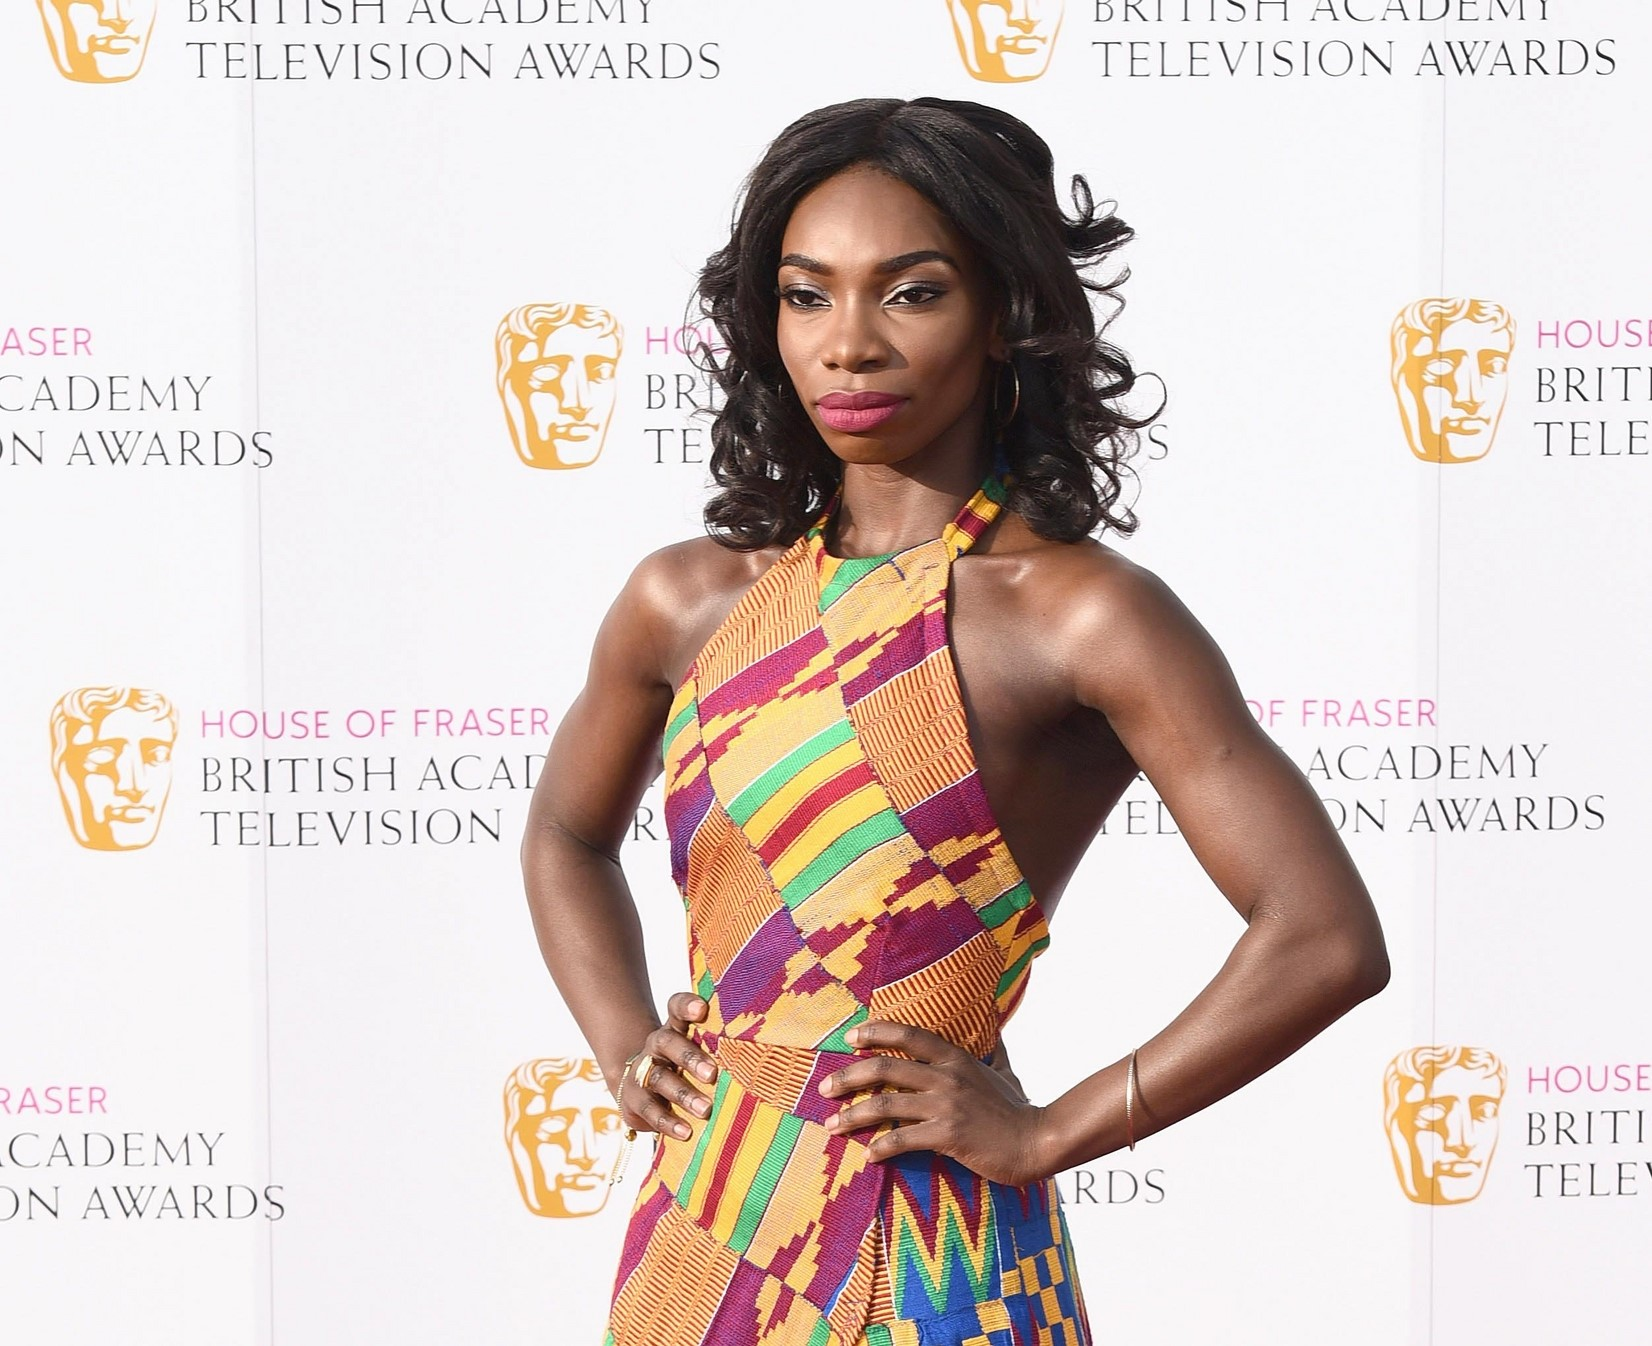 House of Fraser British Academy Television Awards 2016 – Arrivals